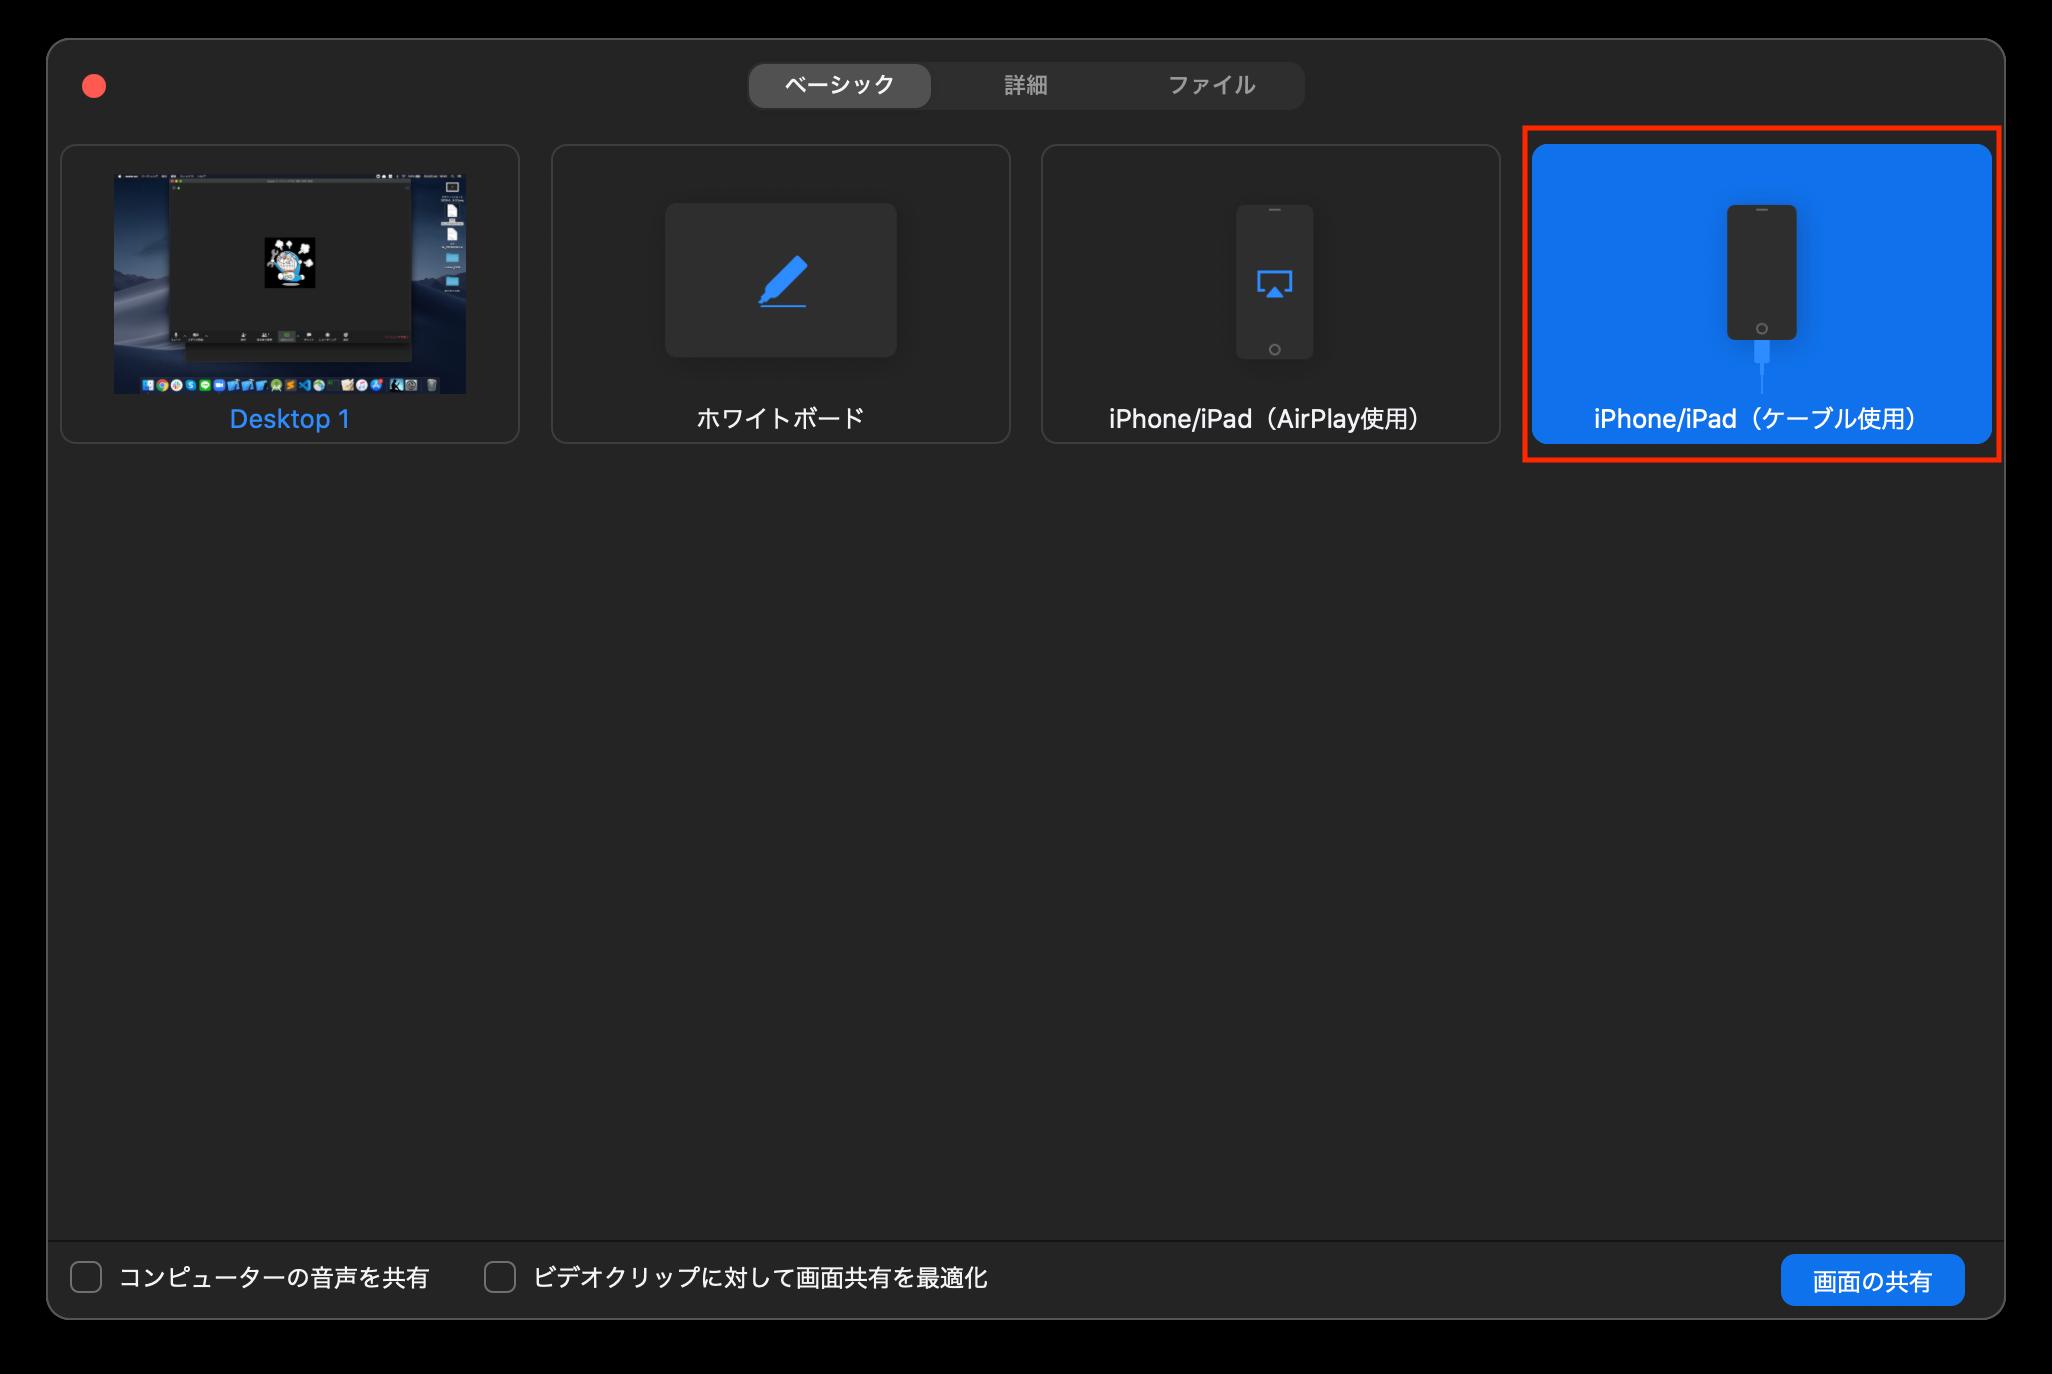 iosスクリーンショット 2020-03-04 19.51.04.png